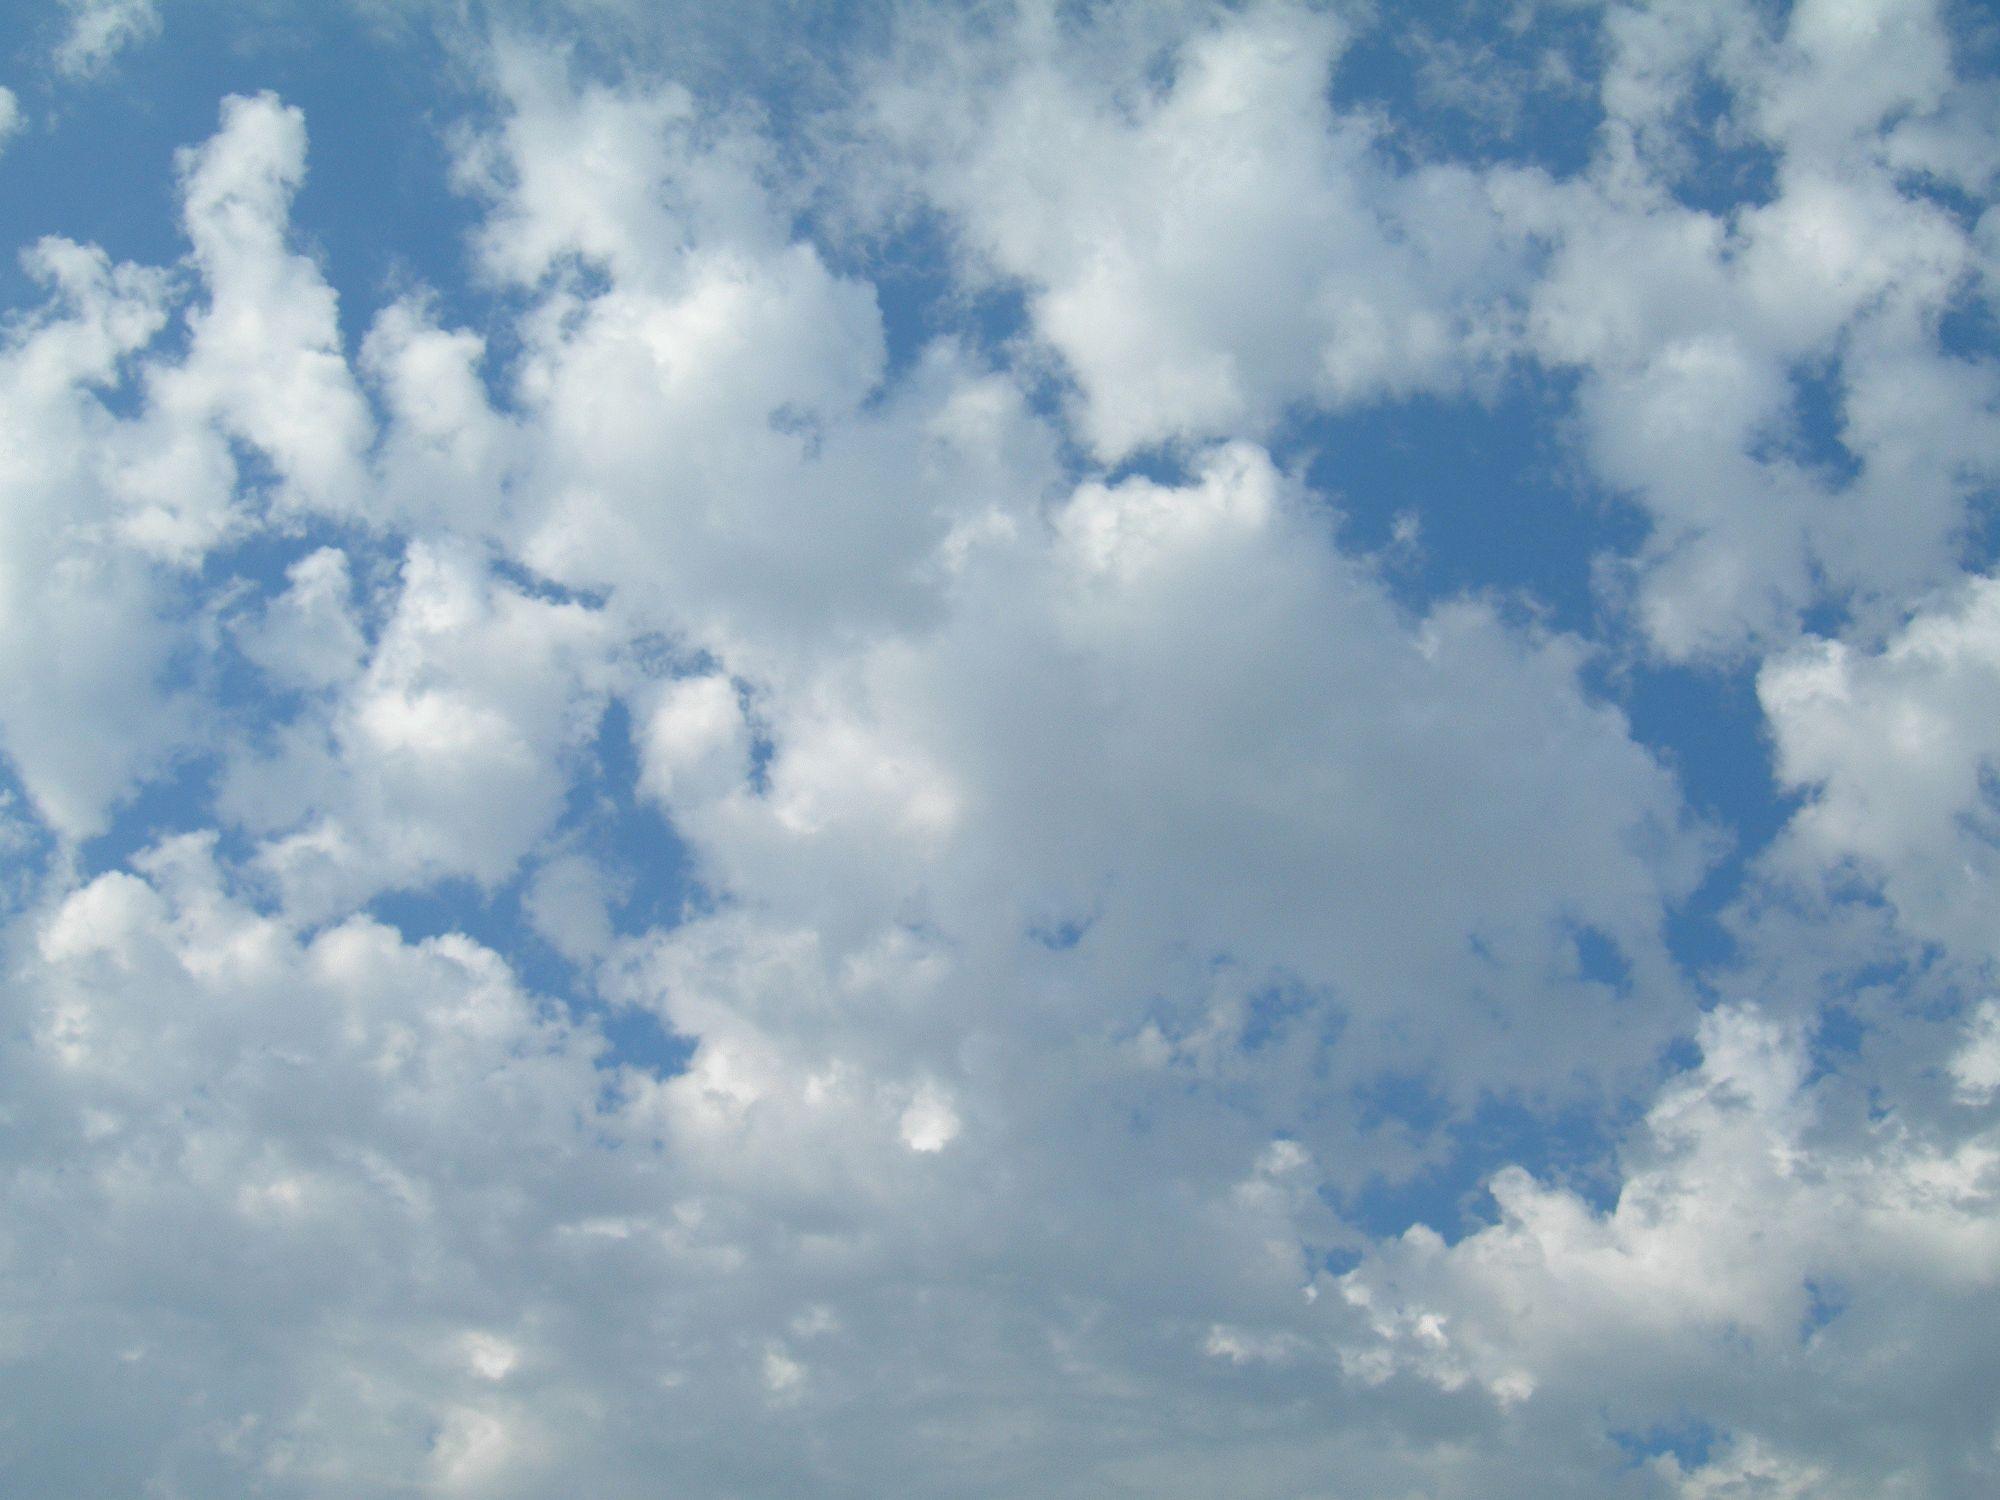 Nuvole  Magdolandia Fotografa